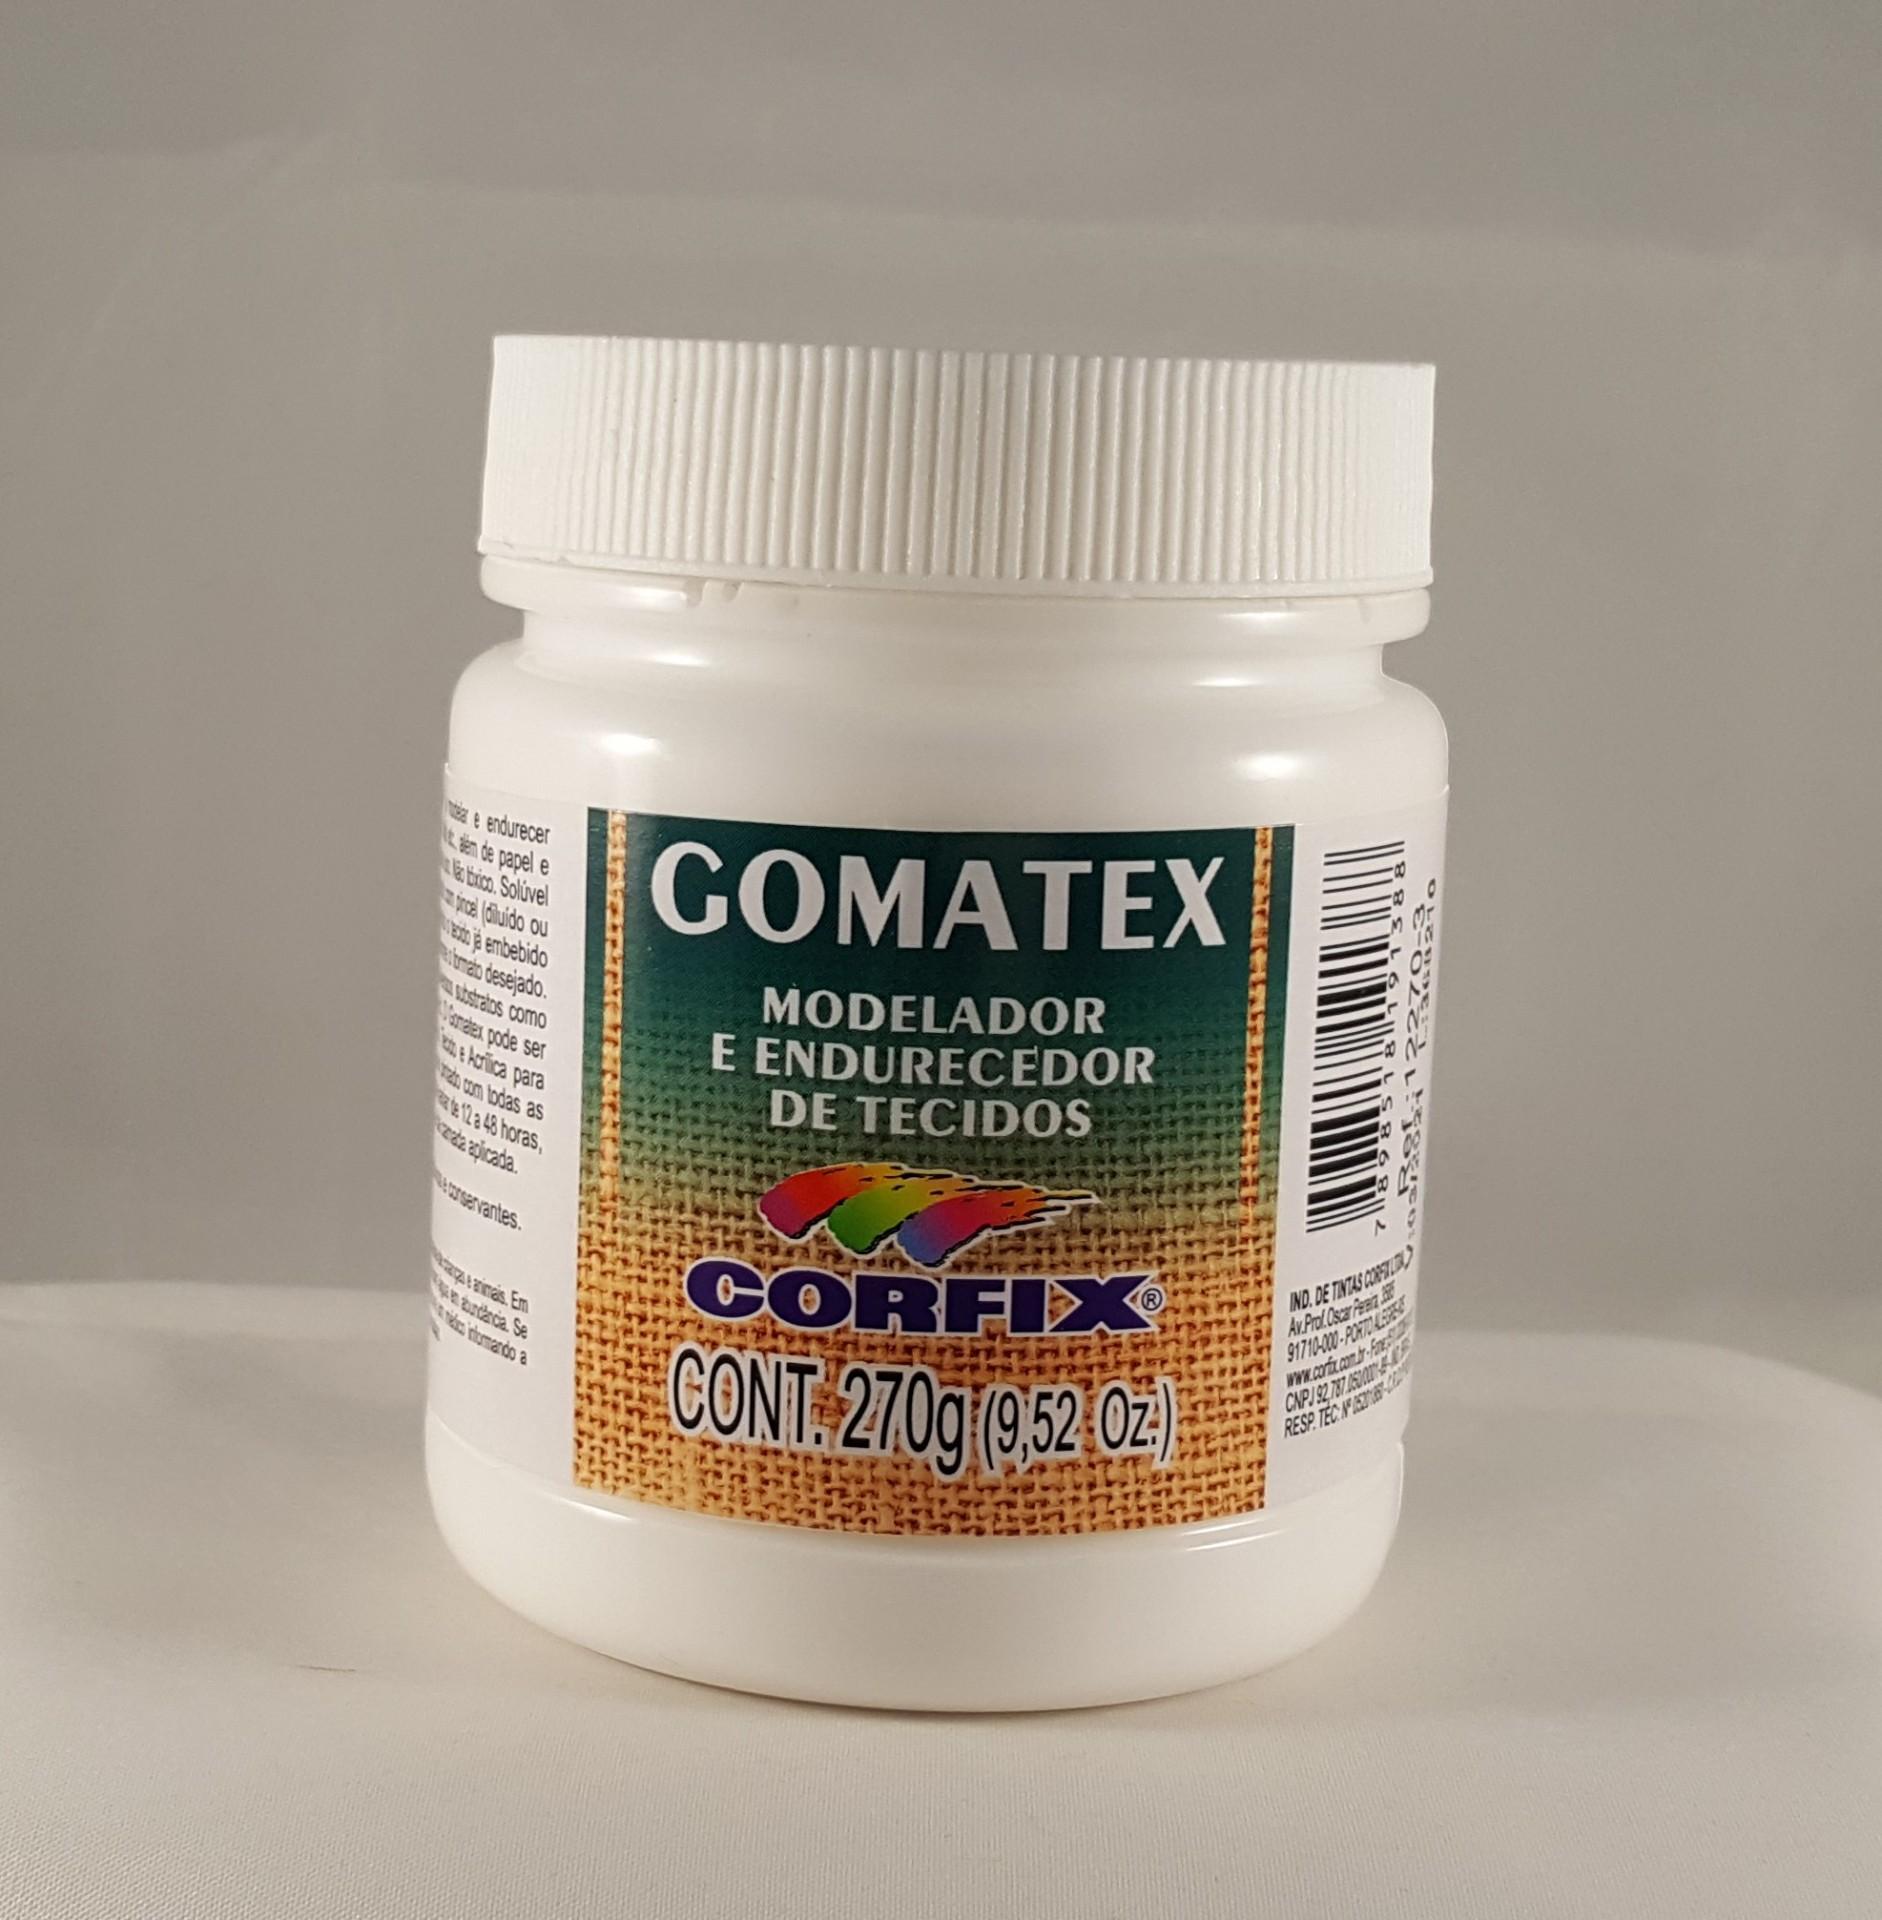 Endurecedor para tecido Gomatex